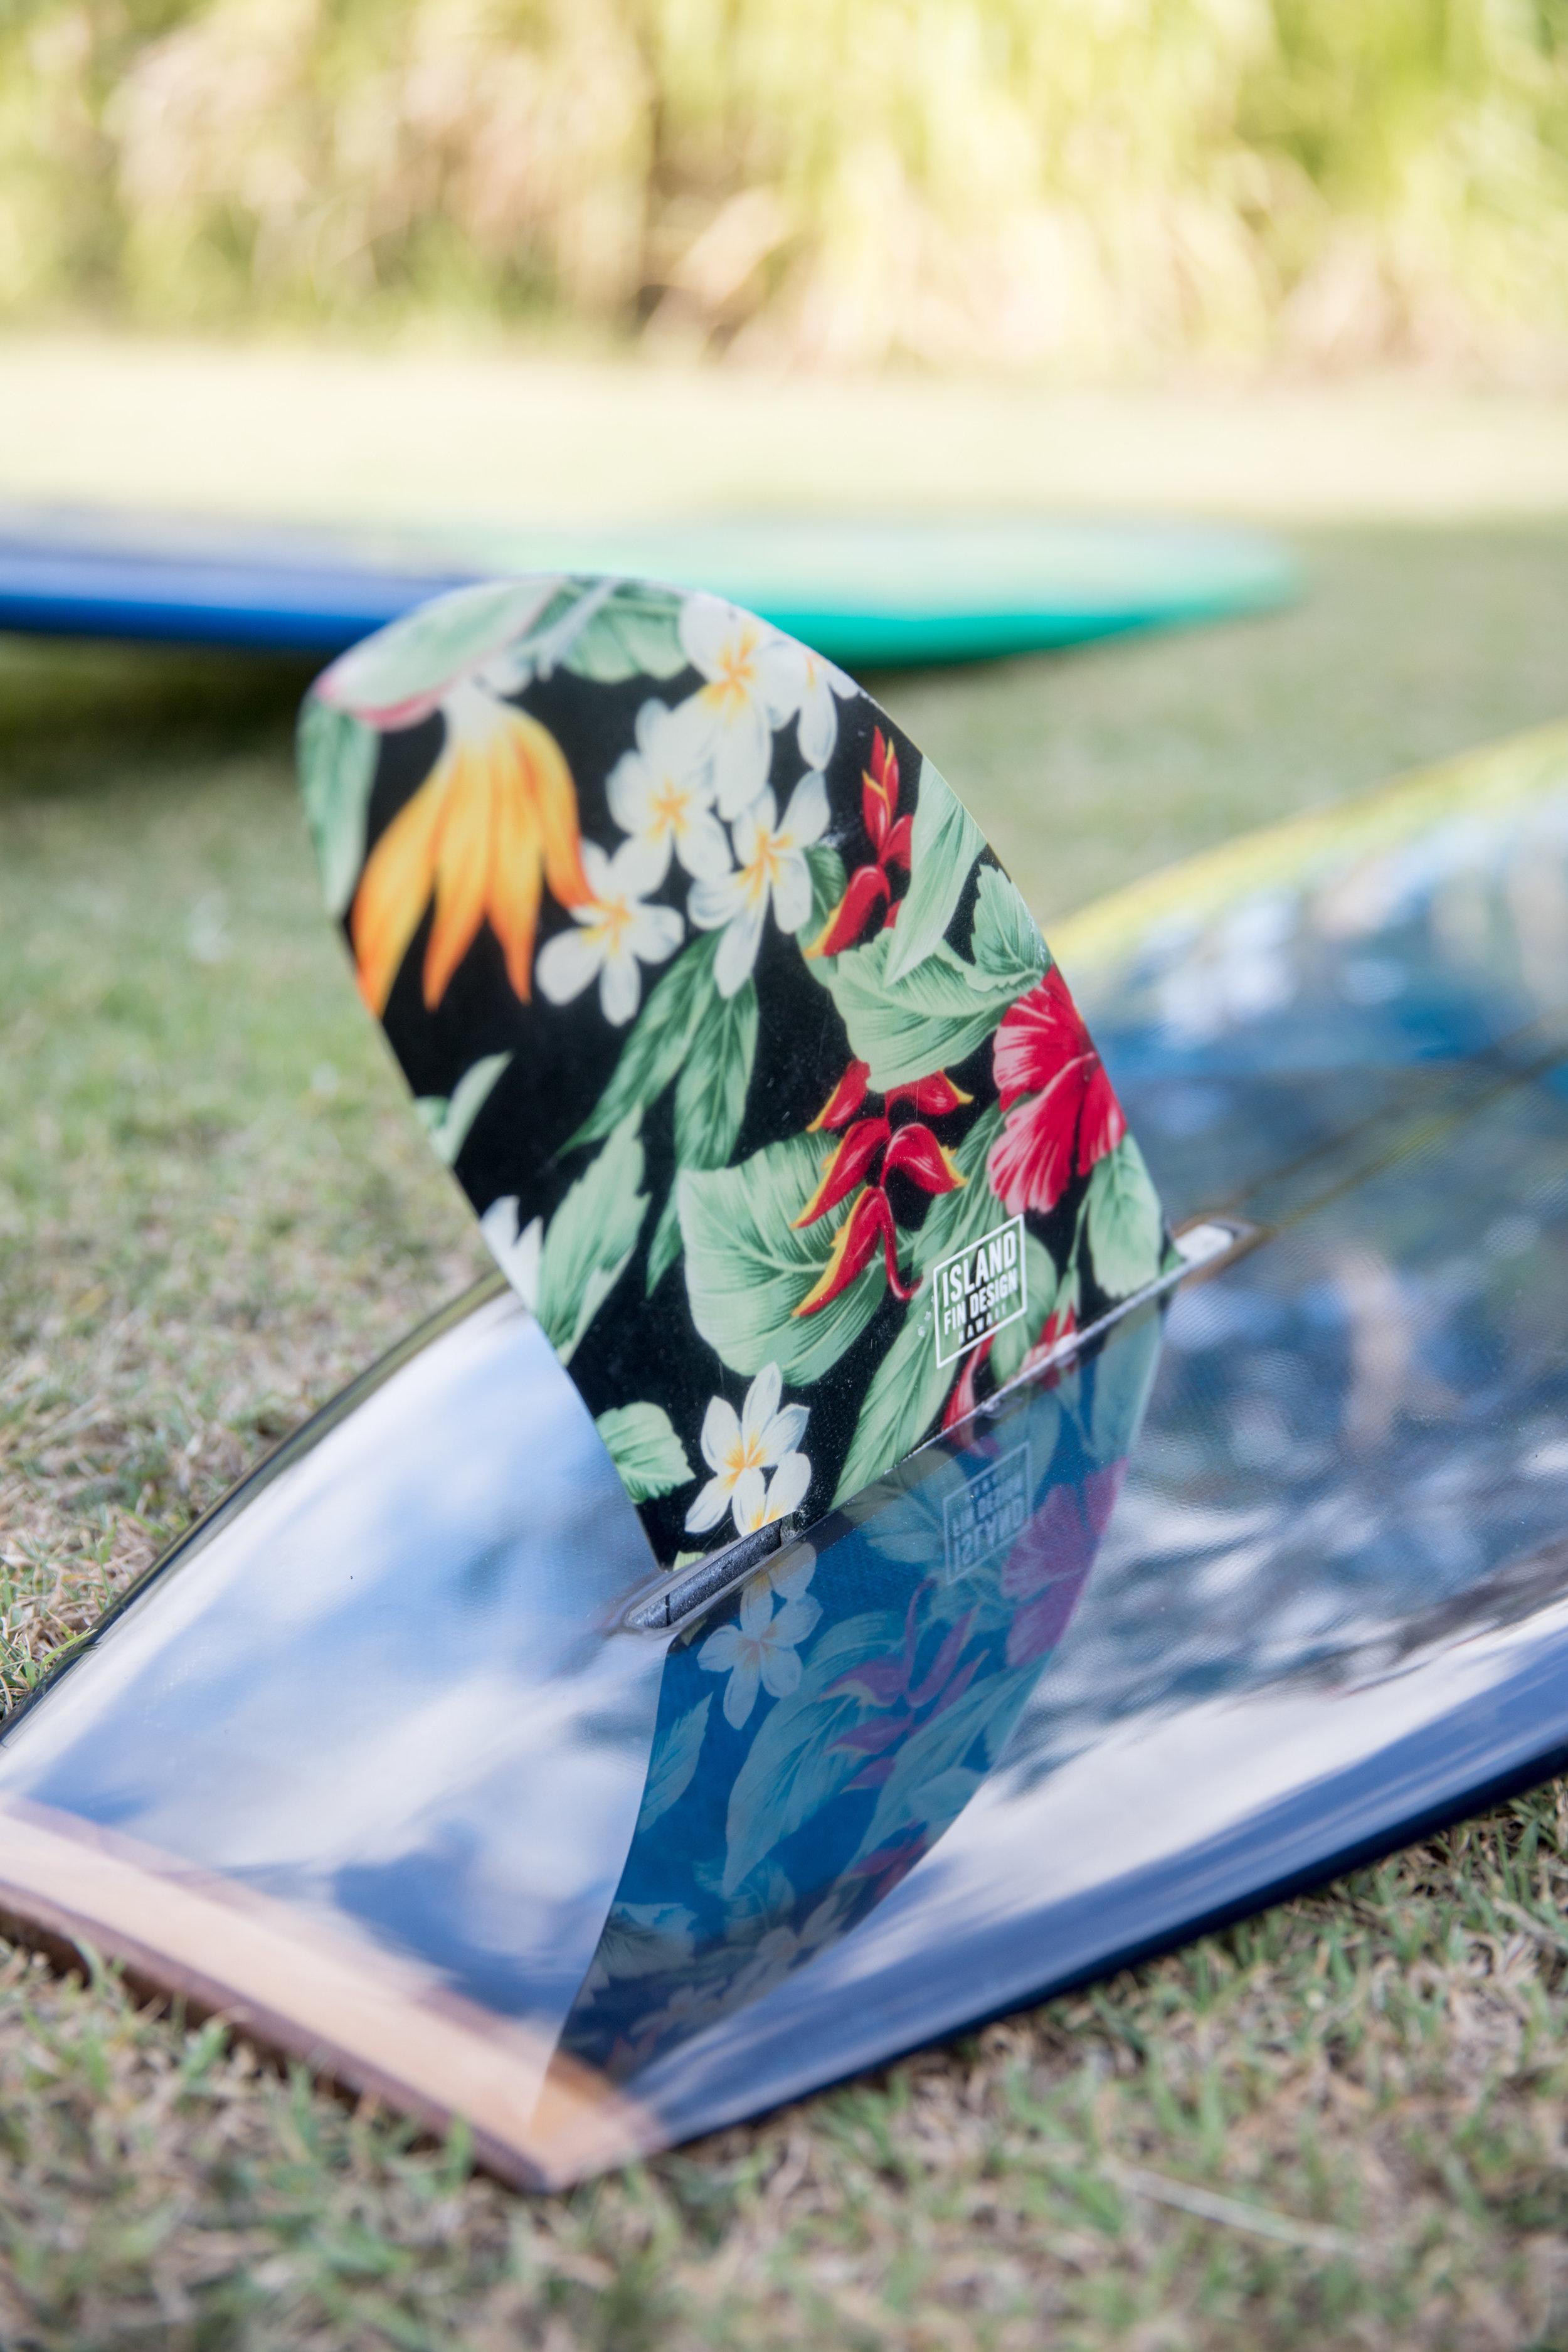 bryce johnson-photography-ebert surfboards-kauai-41.jpg